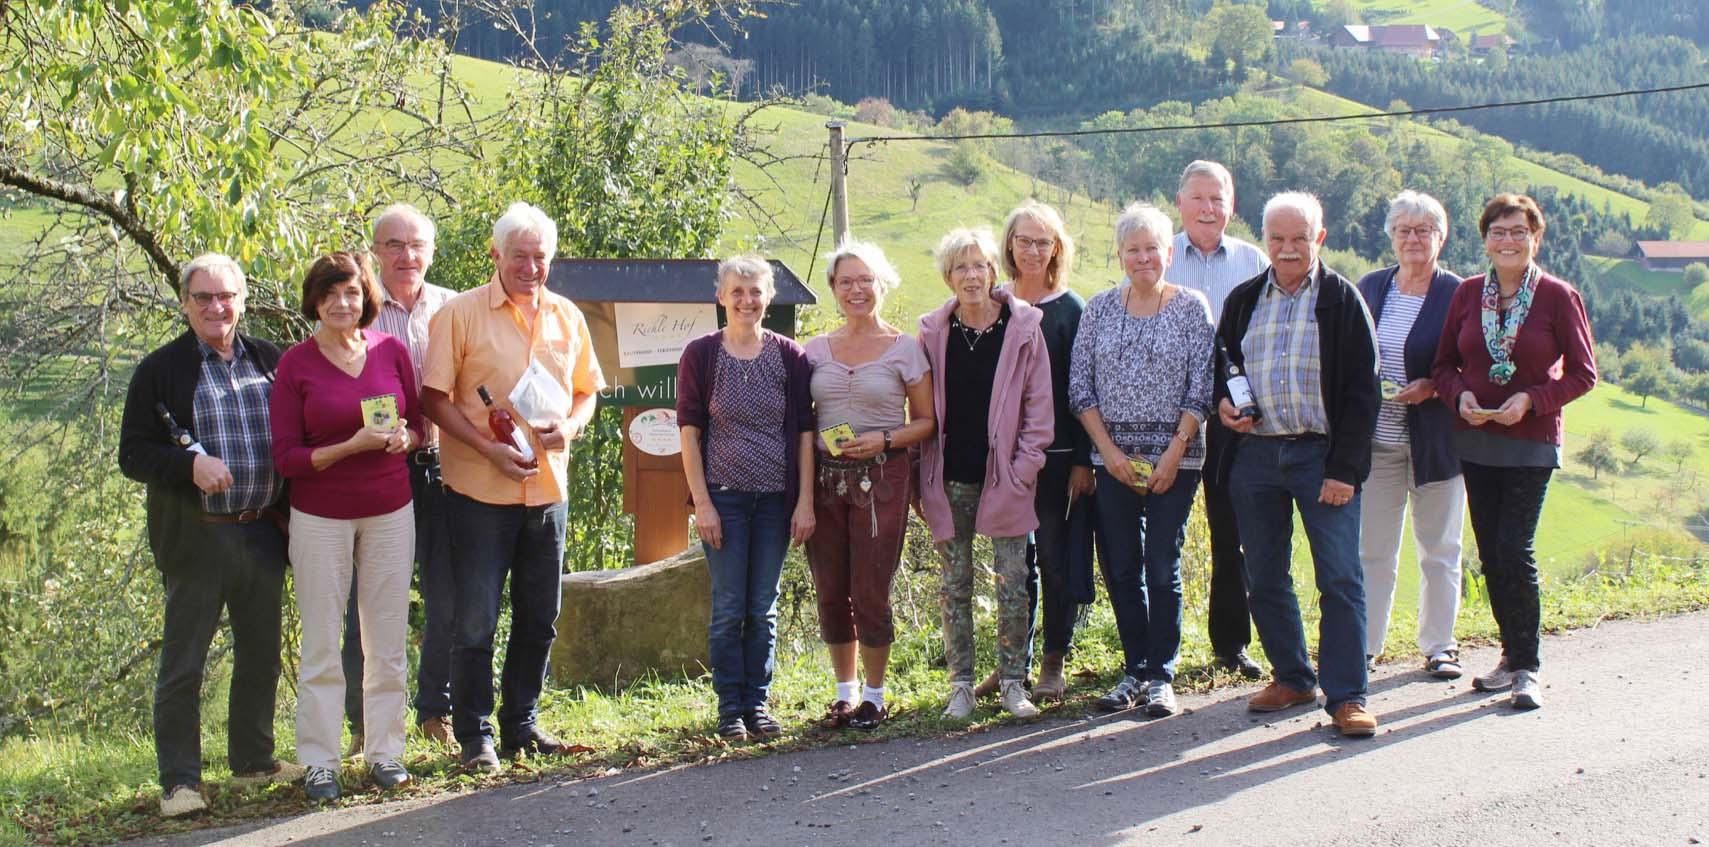 2019-10-4-ZE-OE-Gästeehrung Riehlehof IMG_0010